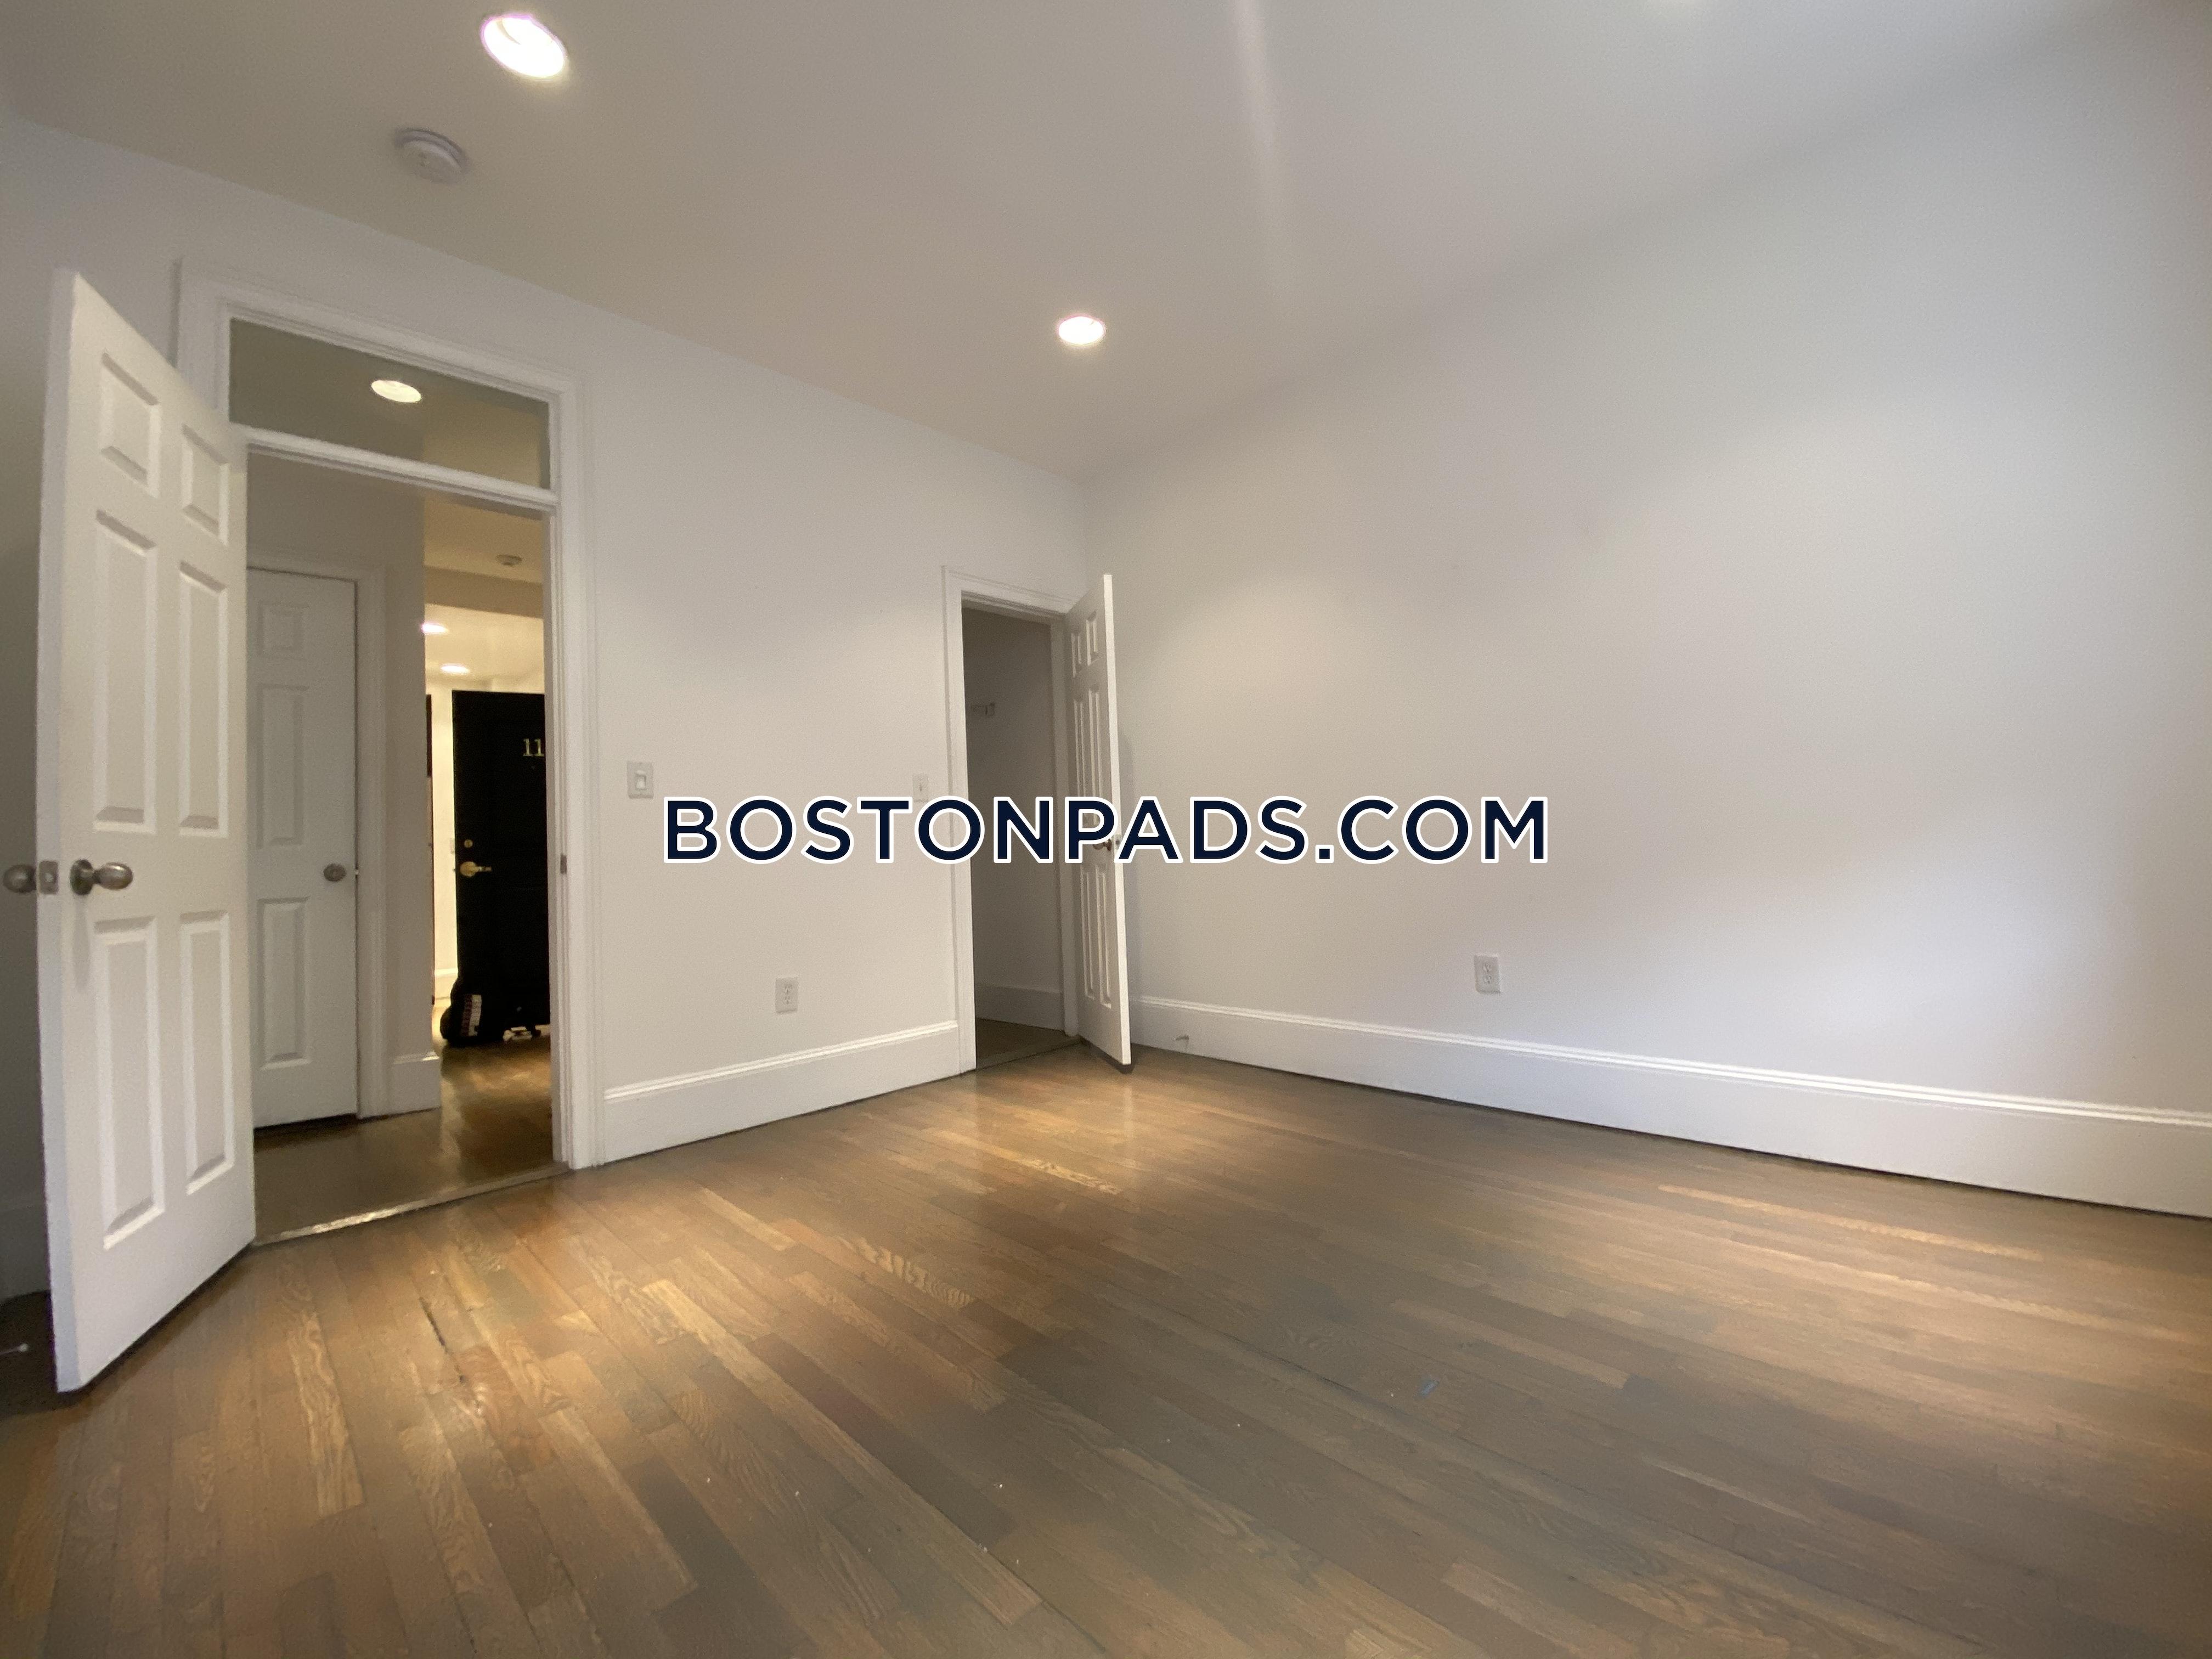 Queensberry St. Boston